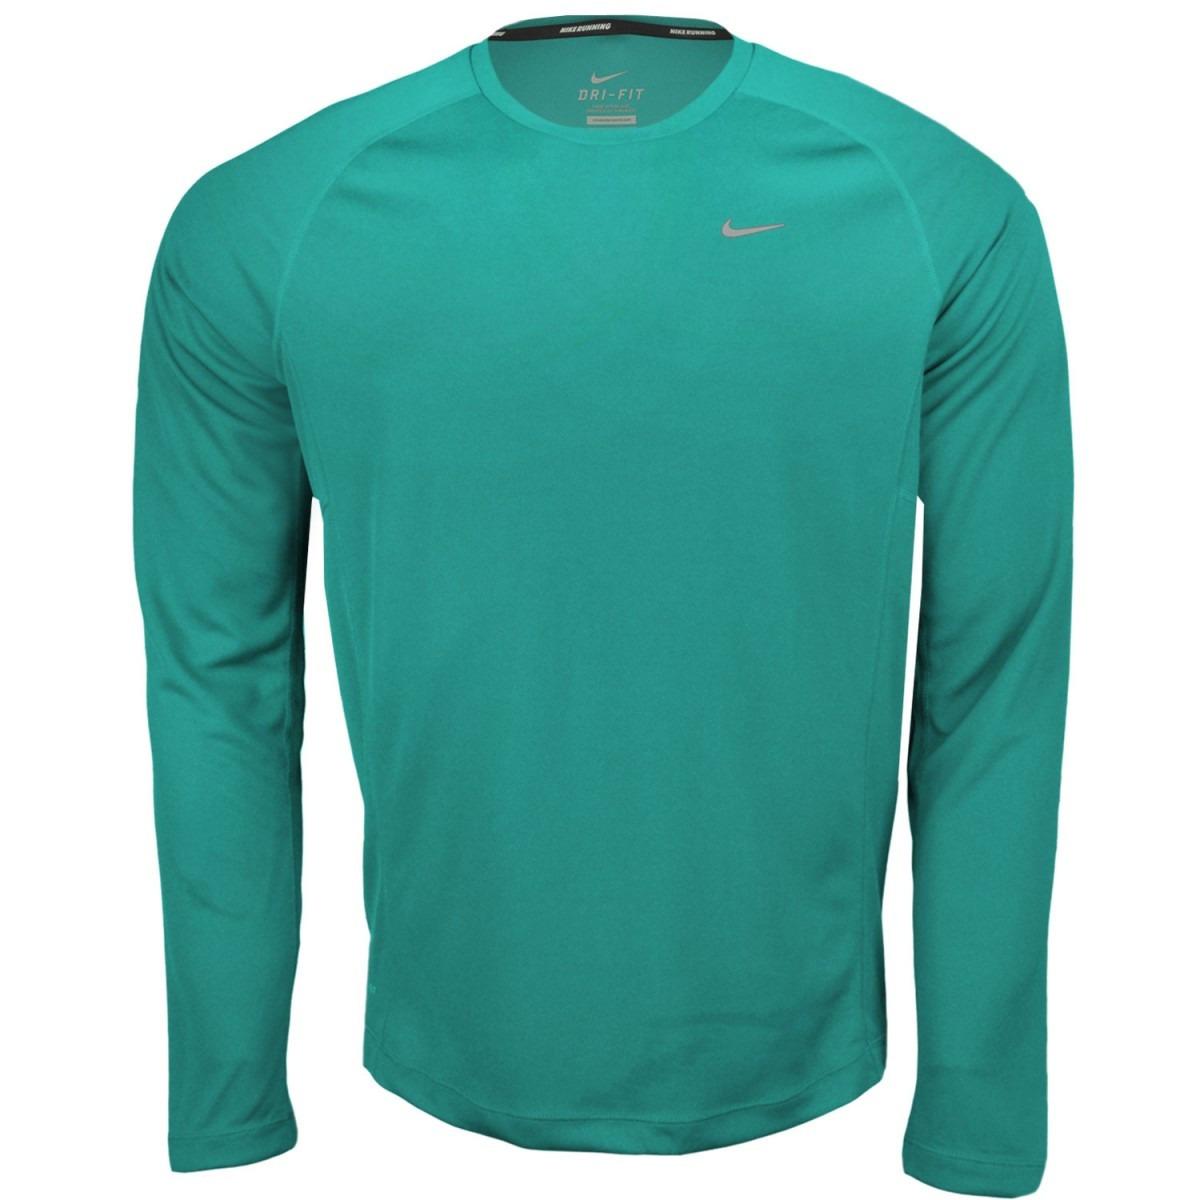 Camisa Nike Running Dri Fit Miler Manga Longa De 199 e9f7c64fd82ef